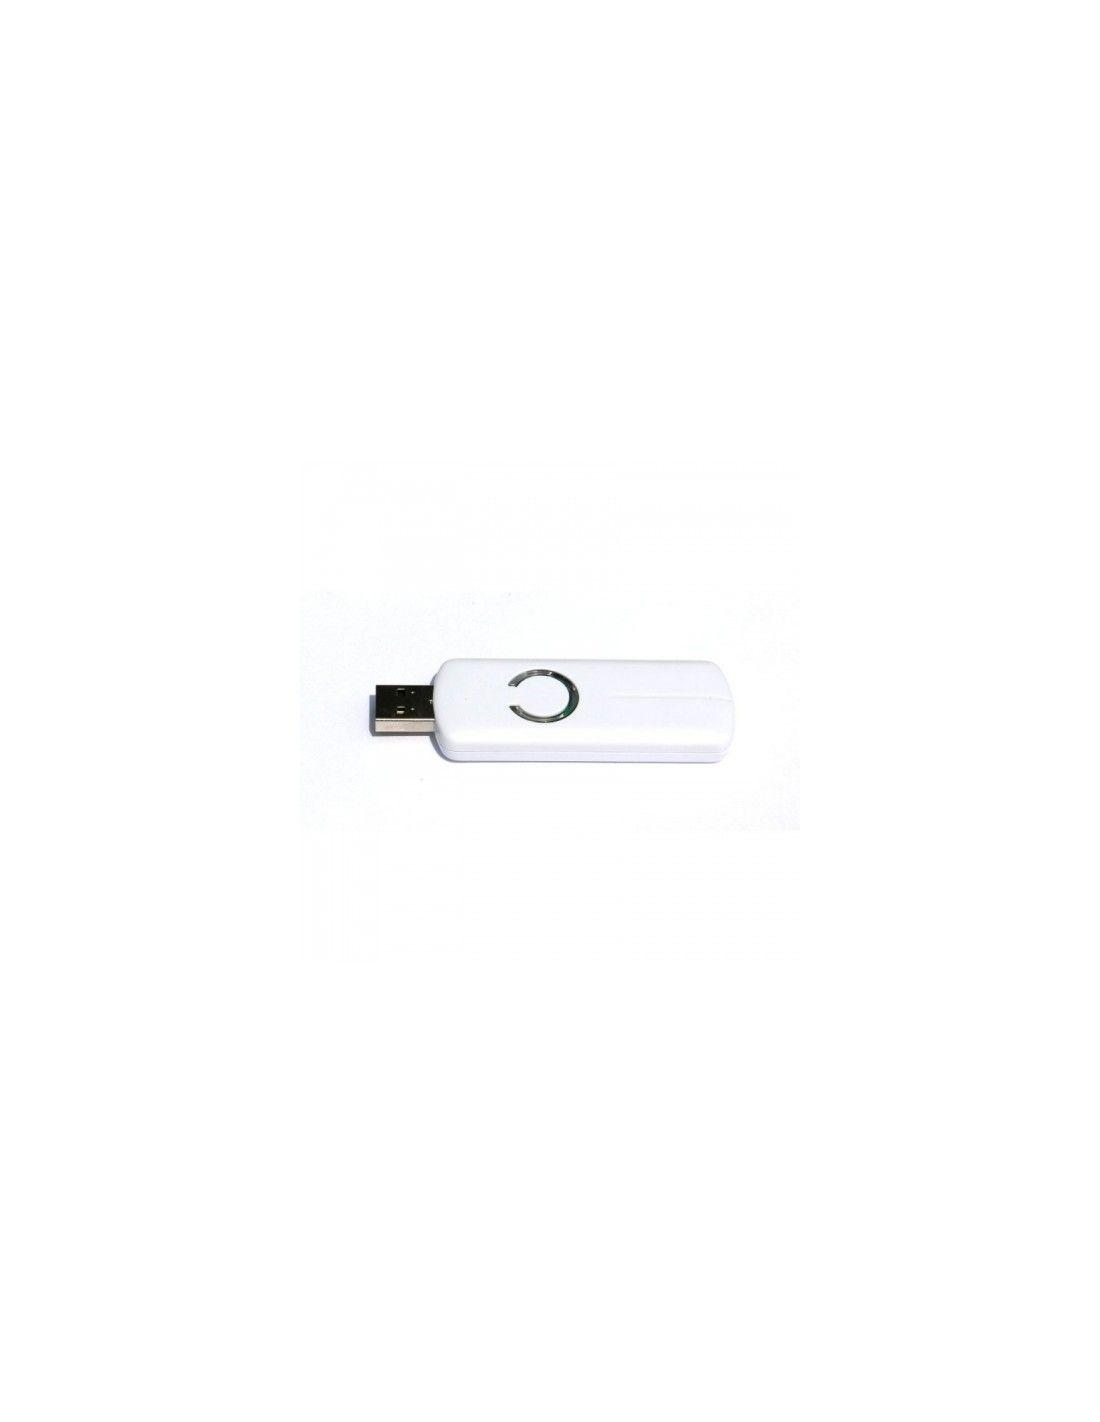 Aeon Labs Controller Usb Z Wave Plus Z Stick Zw090c Gen5